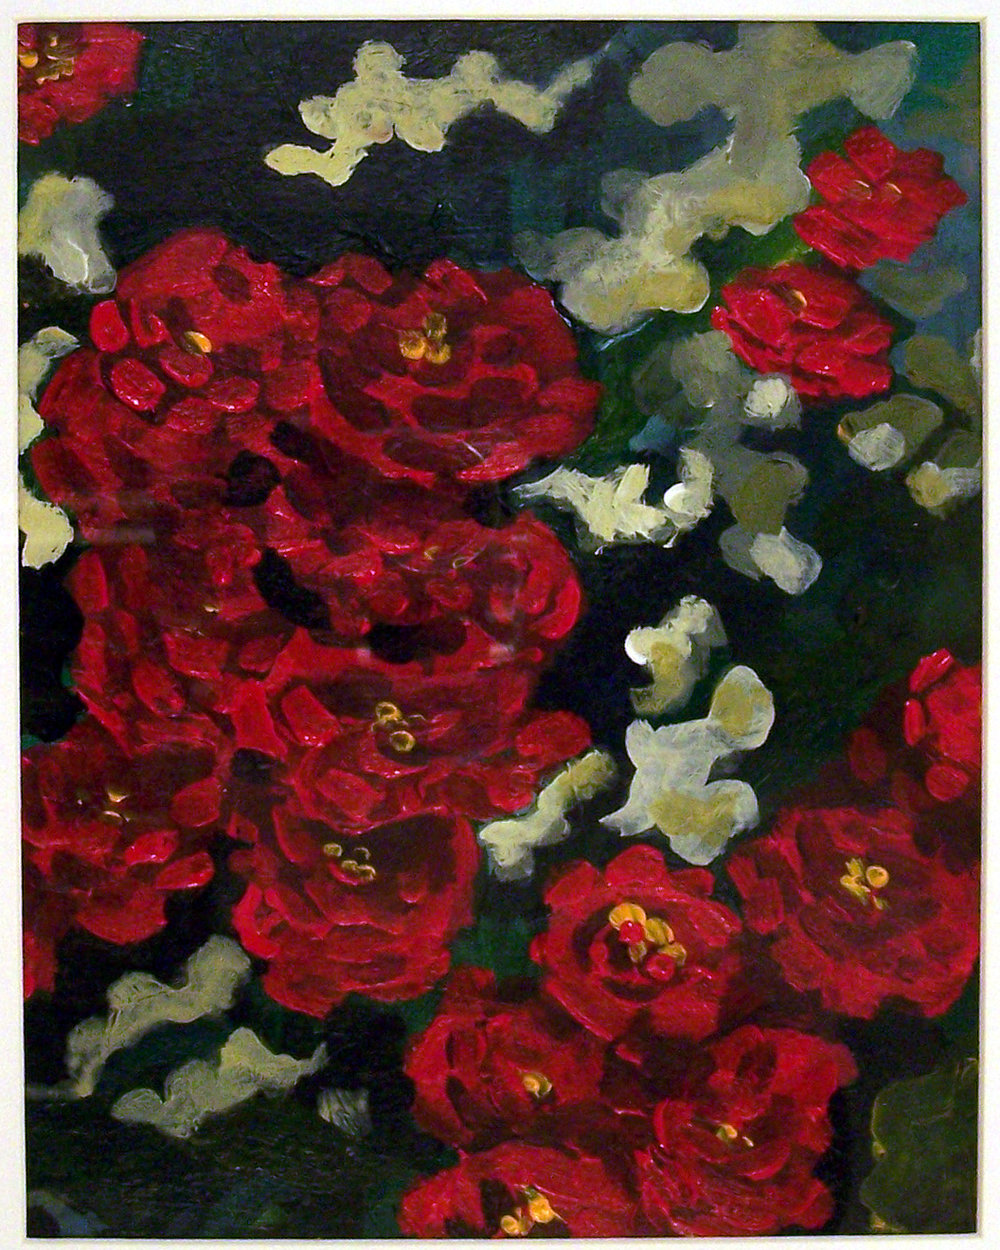 NMarcel-2007-acrylic on paper-red roses.jpg